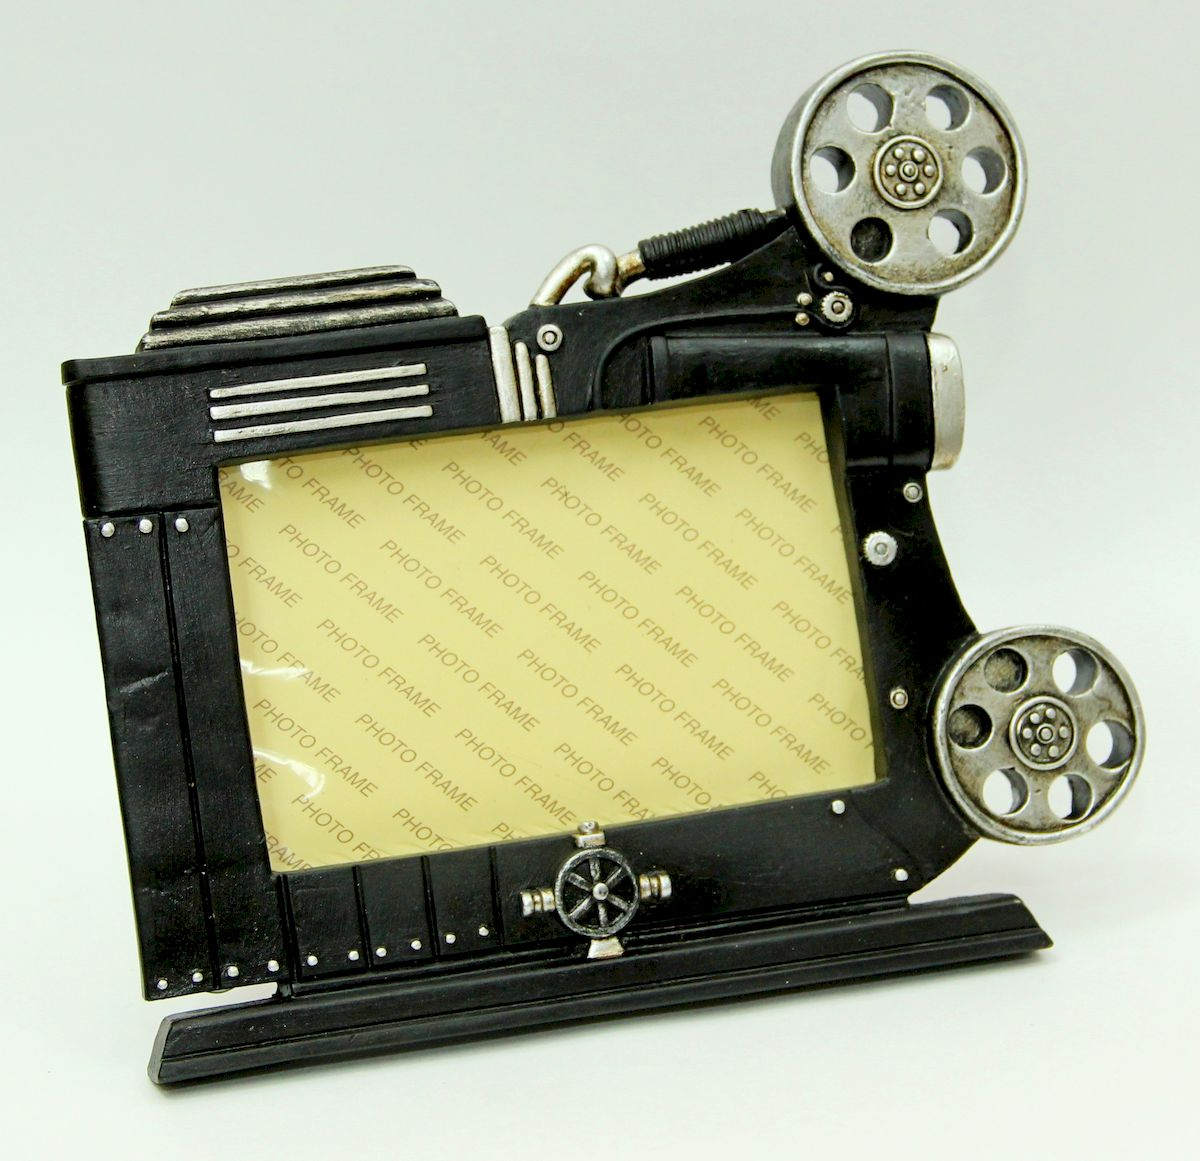 Фоторамка Magic Home Кино, 10 х 15 см фоторамка кино magic home фоторамка кино